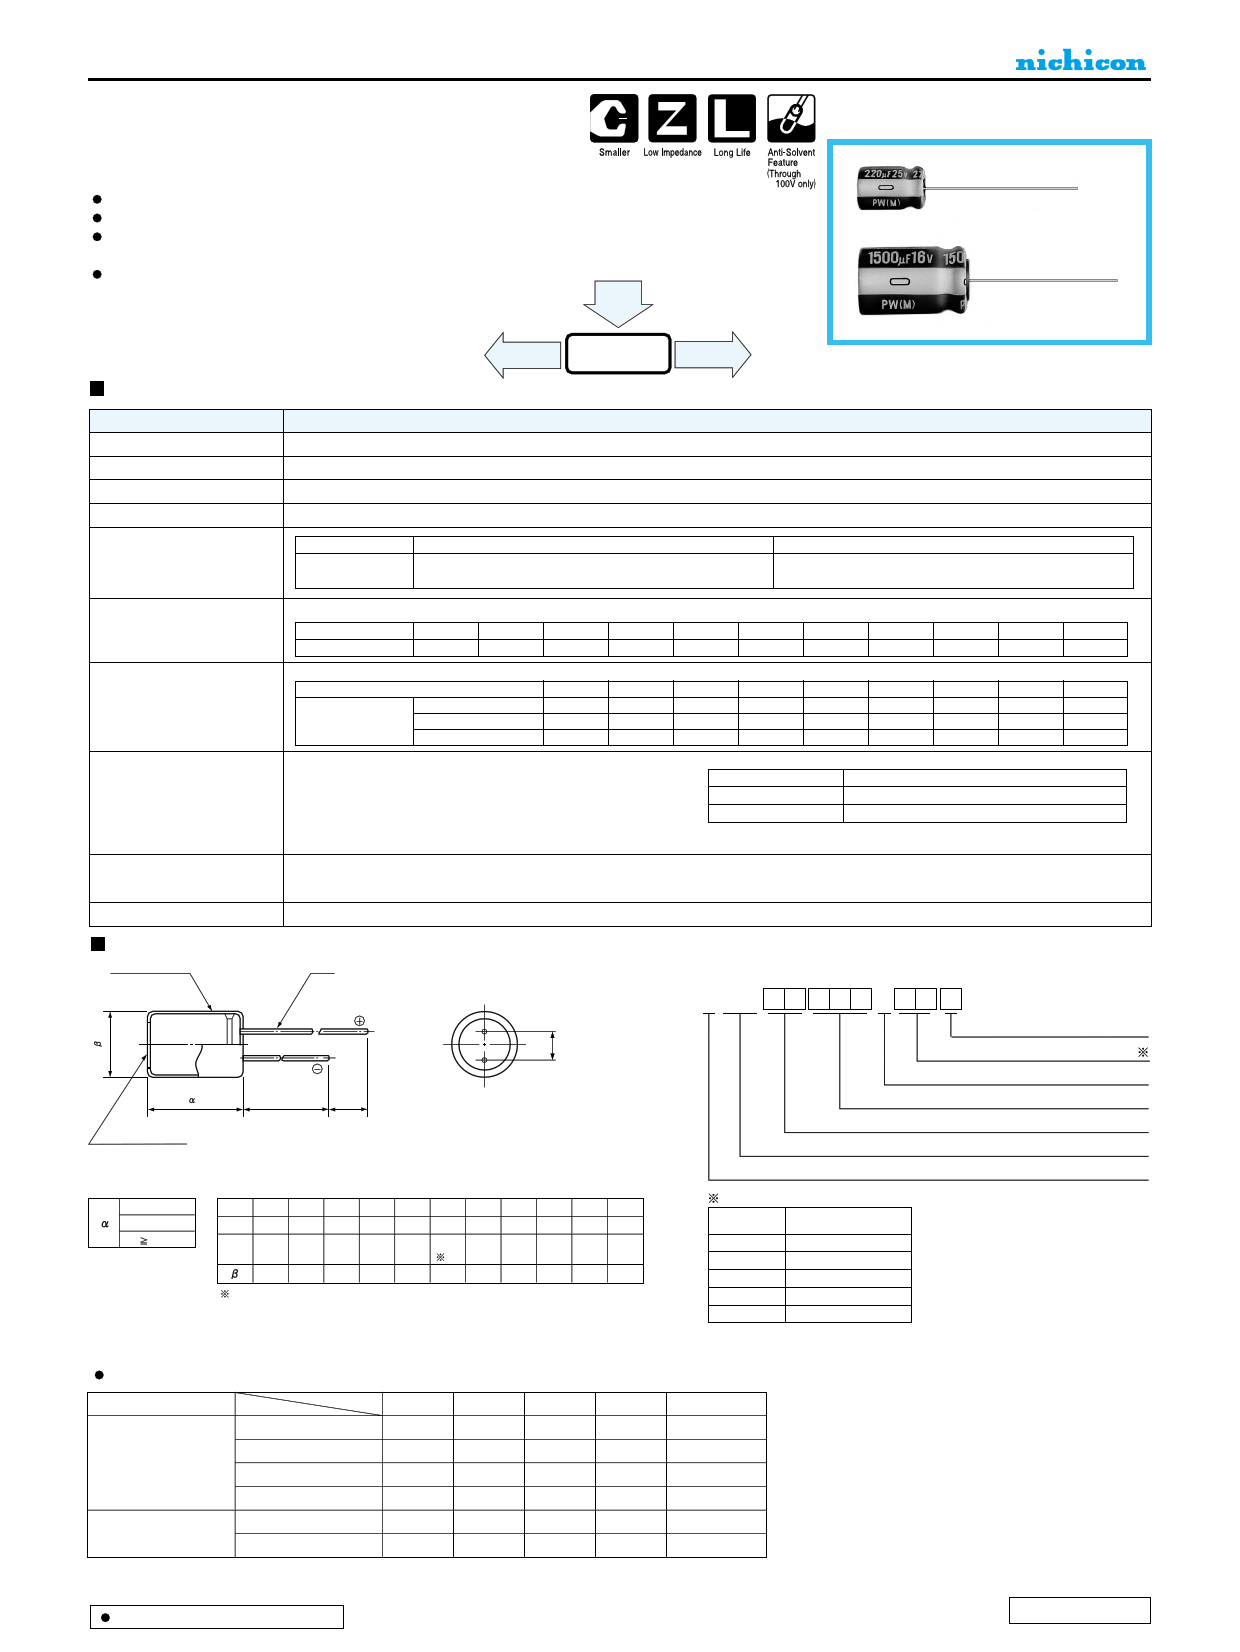 UPW1A821MPD 데이터시트 및 UPW1A821MPD PDF